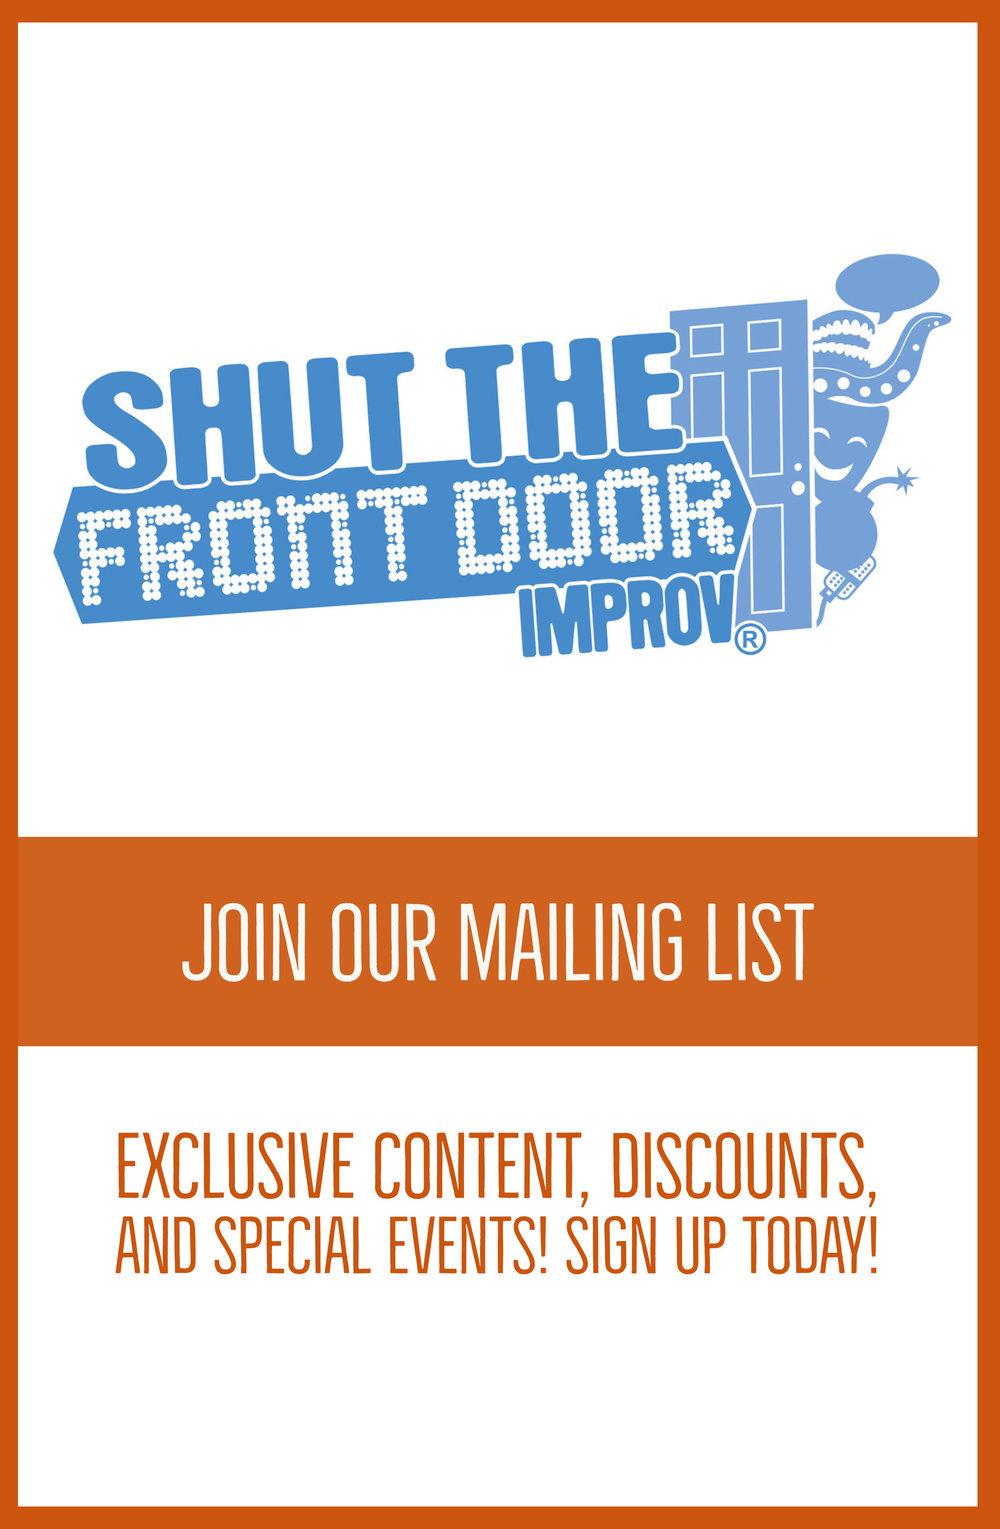 STFD_Mailing_List